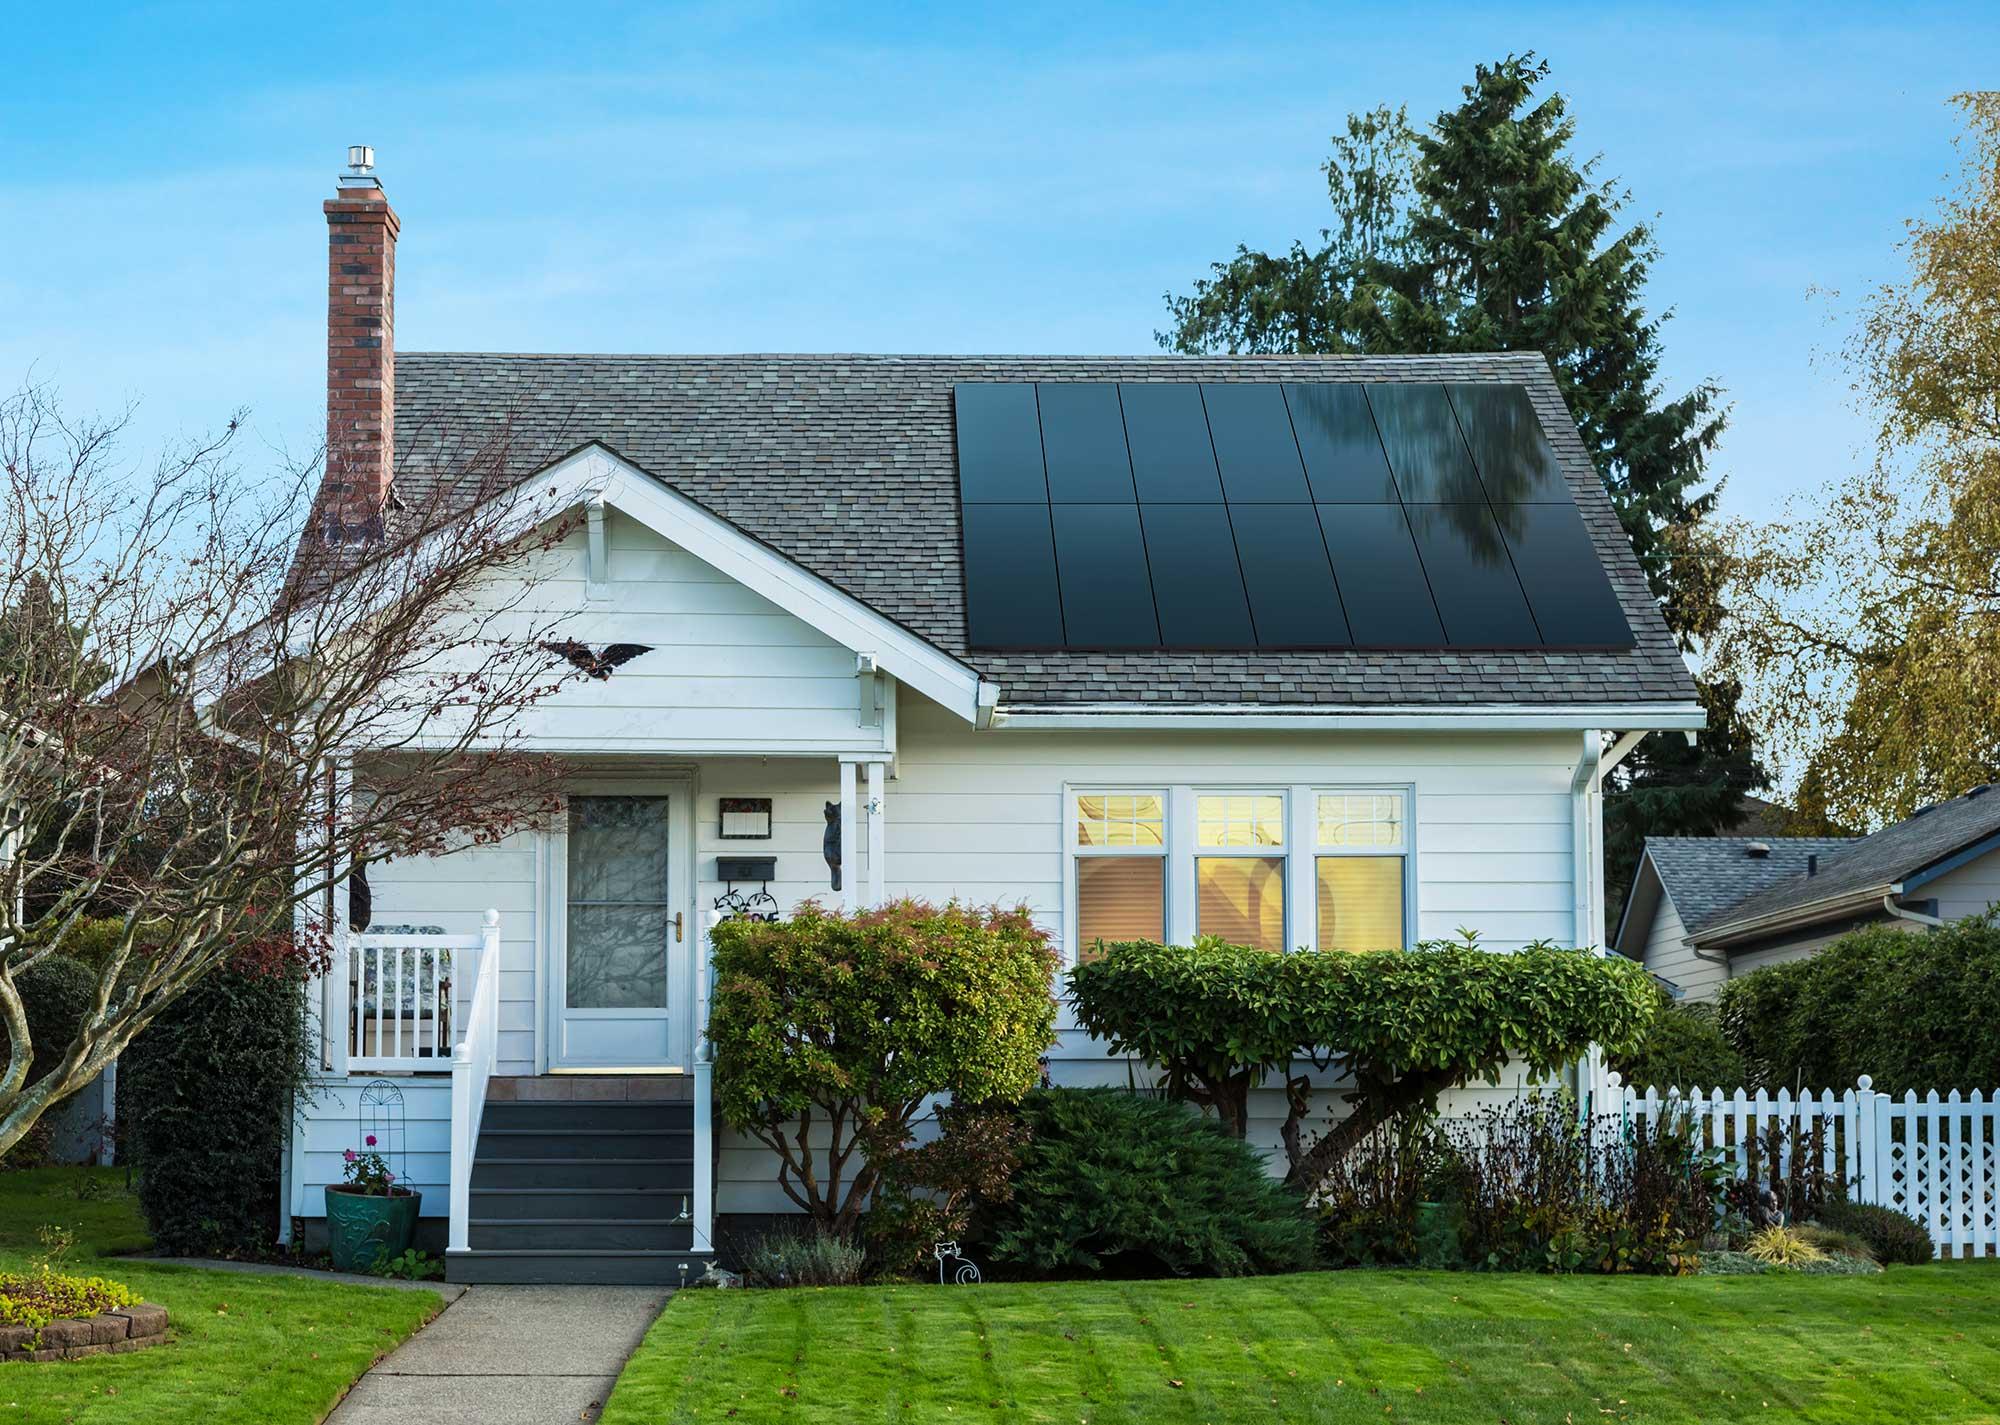 east coast home with panels